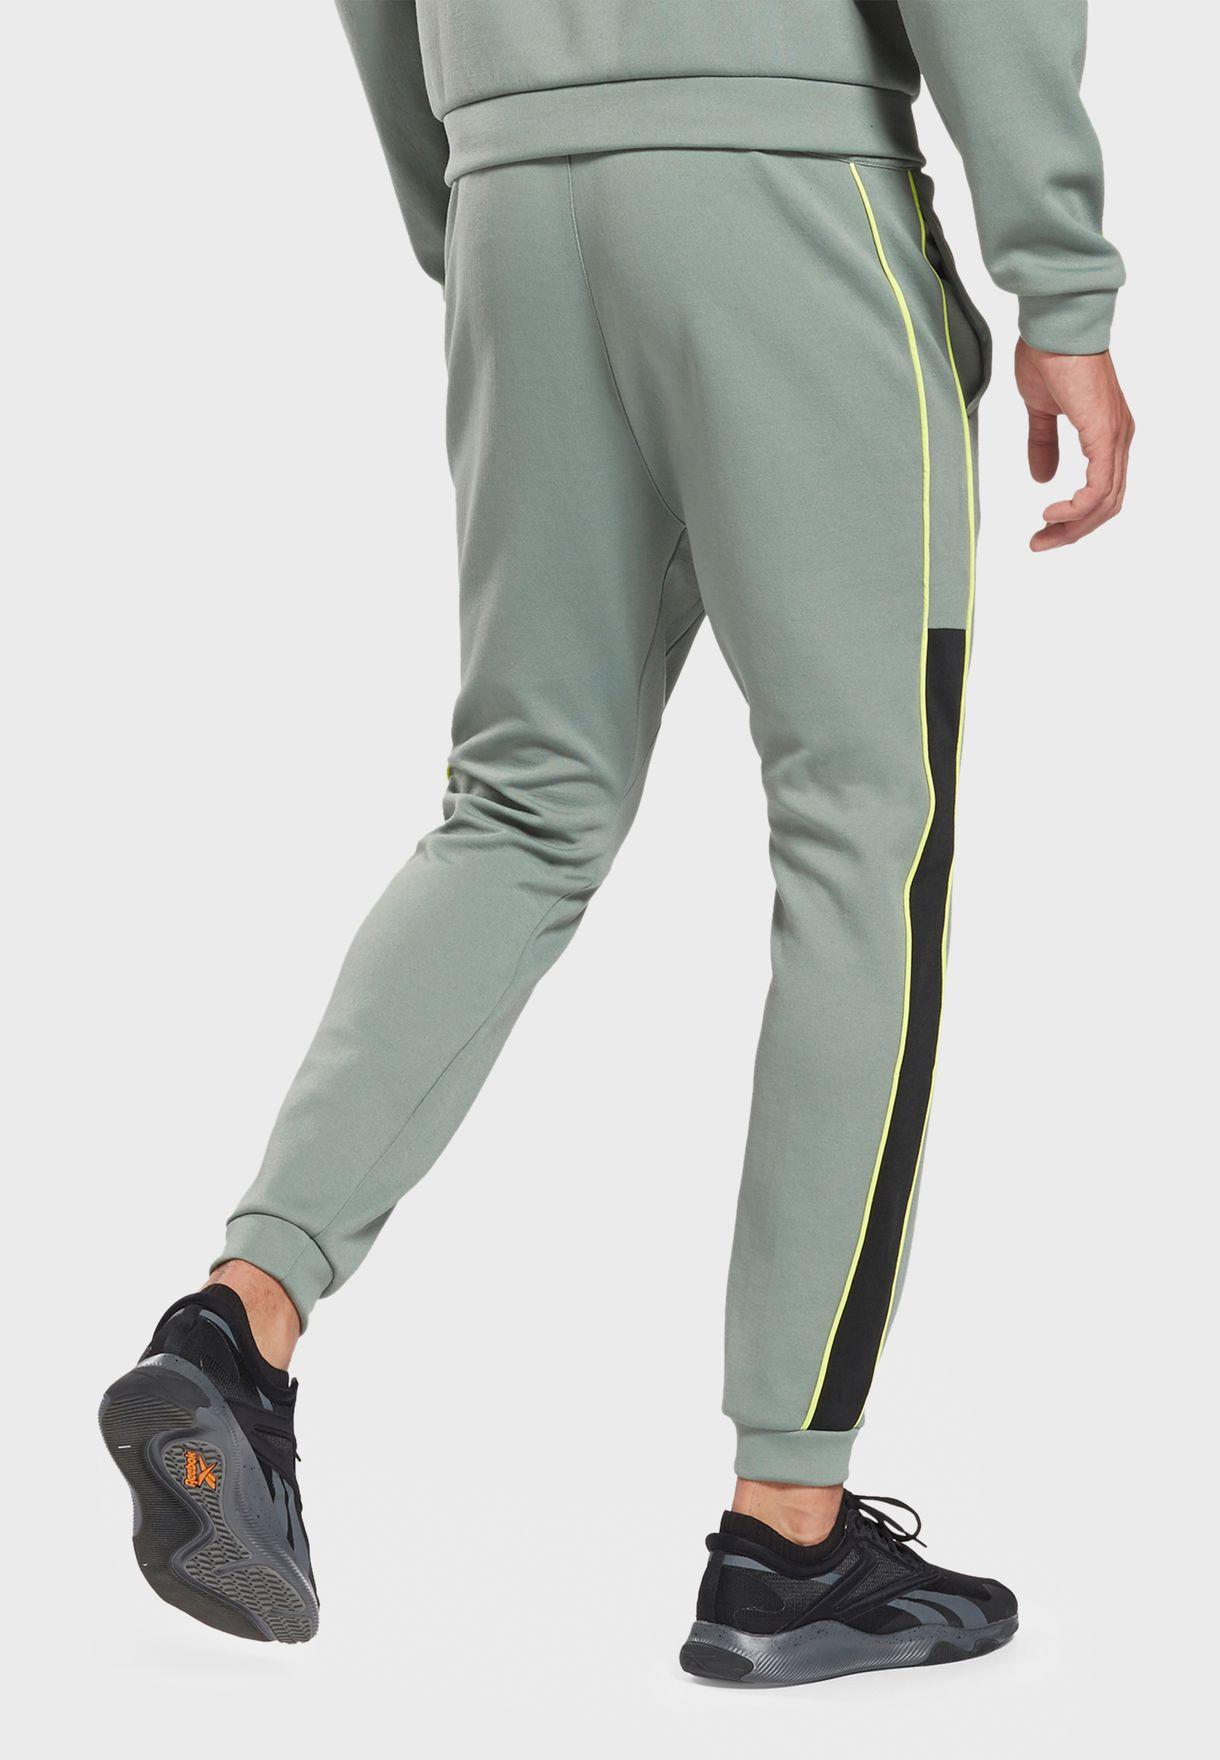 Workout Ready Double Knit Sweatpants